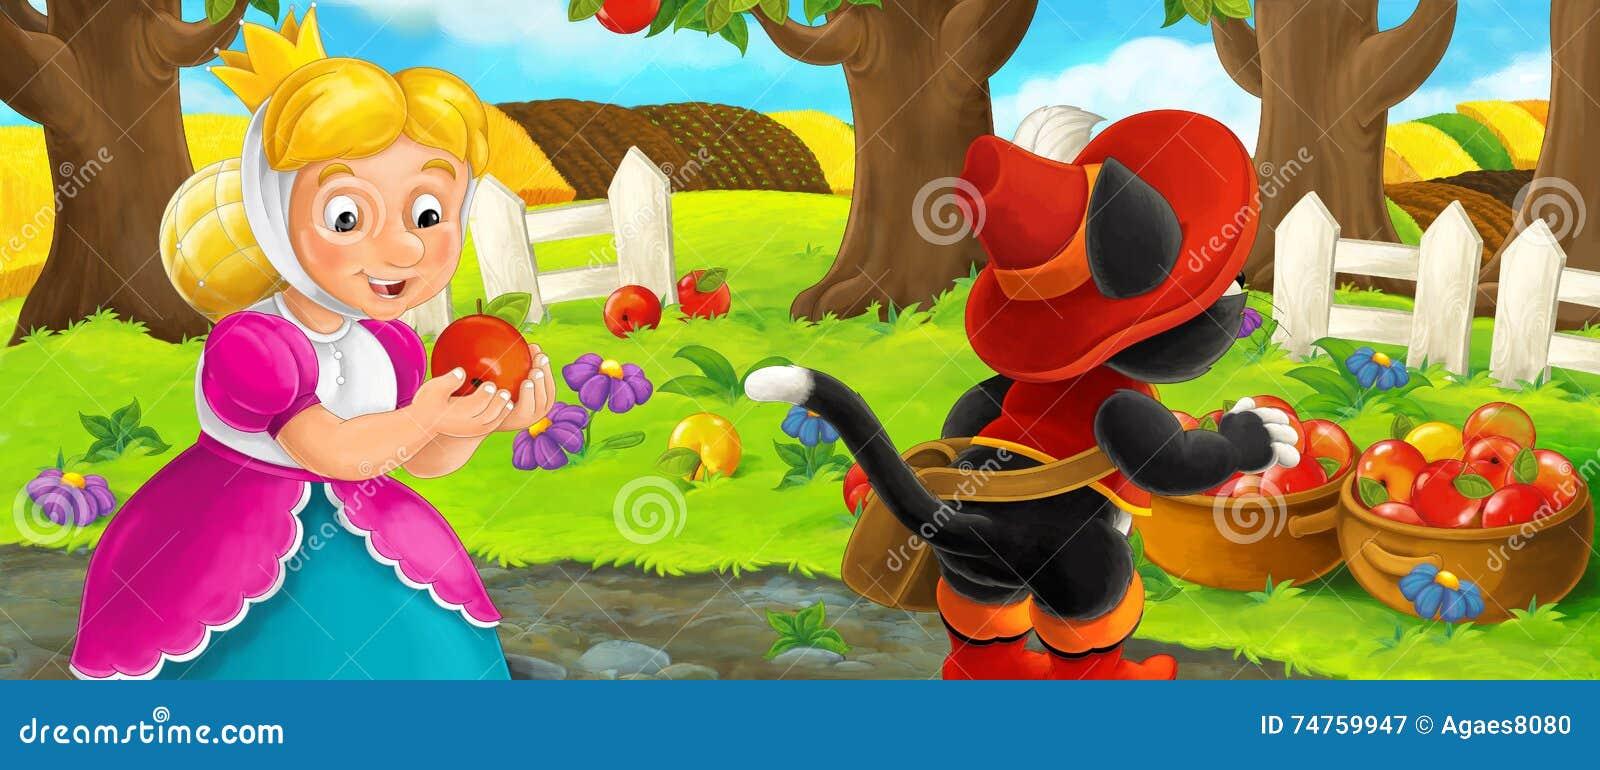 Beautiful garden cartoon - Cartoon Scene With Queen And Cat Traveler Visiting Apple Garden During Beautiful Day Stock Illustration